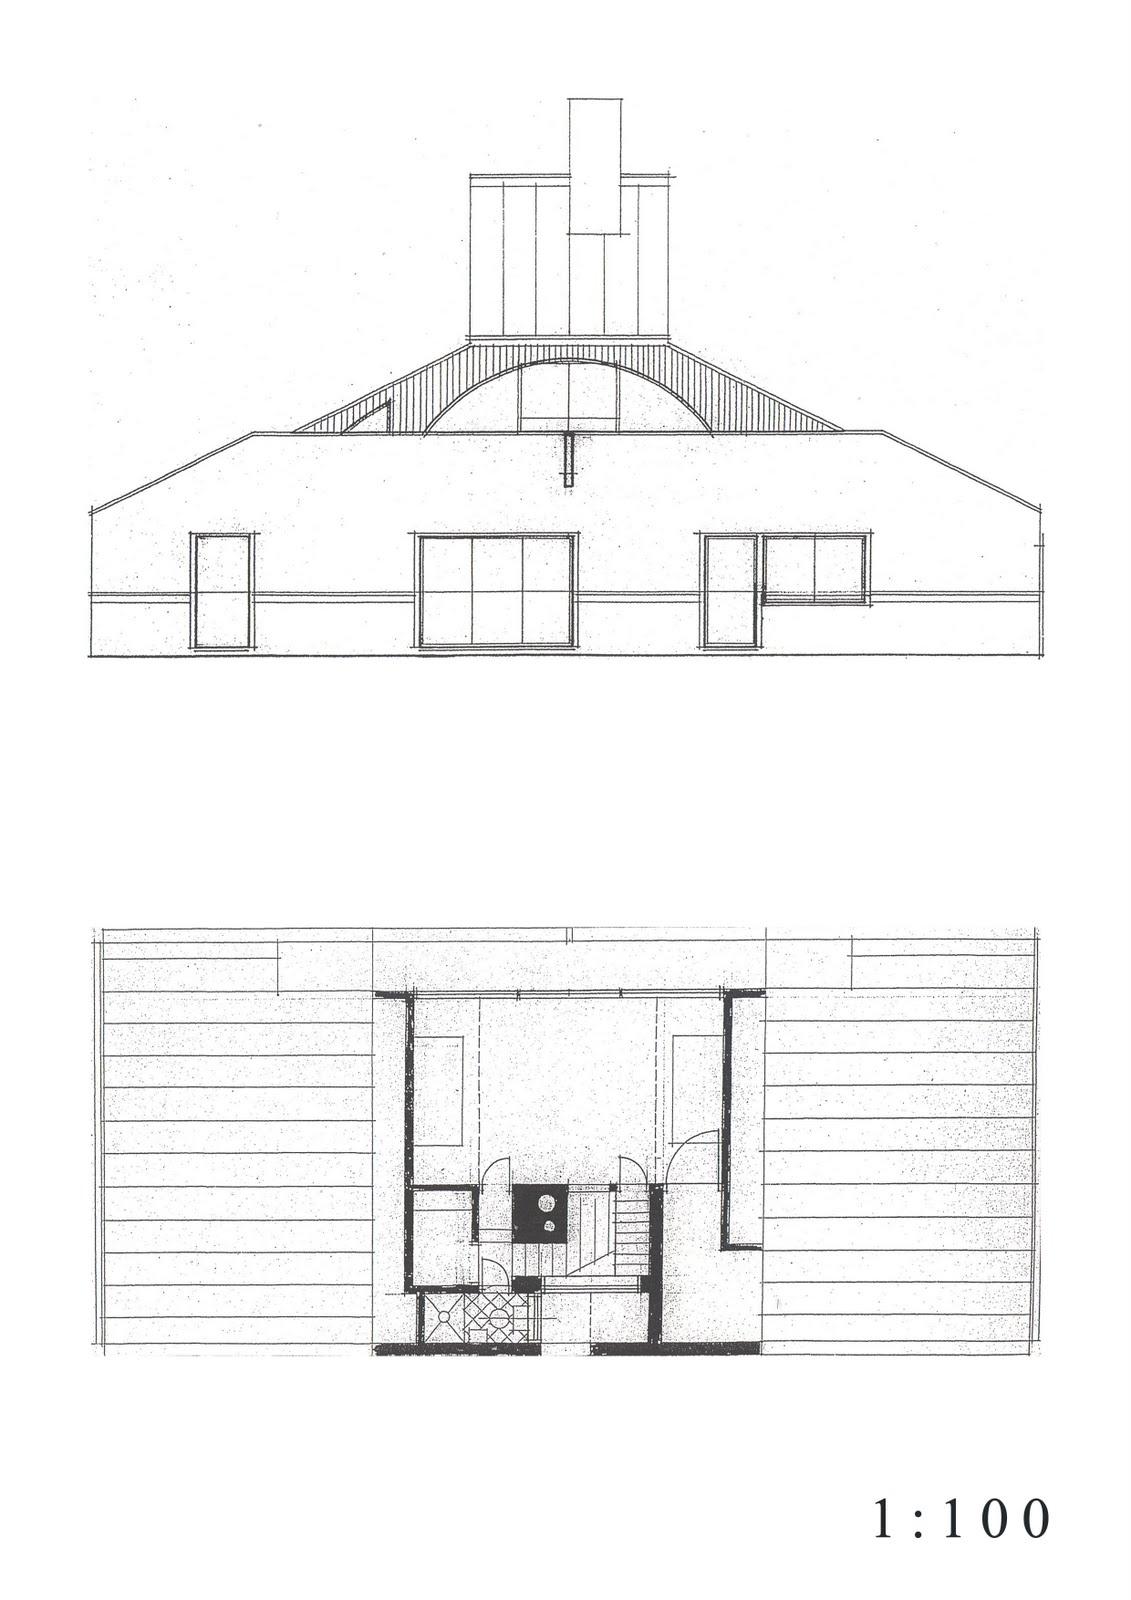 Scale100_A4_02 Vanna Venturi House Plan Section Elevation on fisher house elevation, vanna venturi interior, kaufmann house elevation, eames house elevation, vanna venturi sections dimensions, tugendhat house elevation,